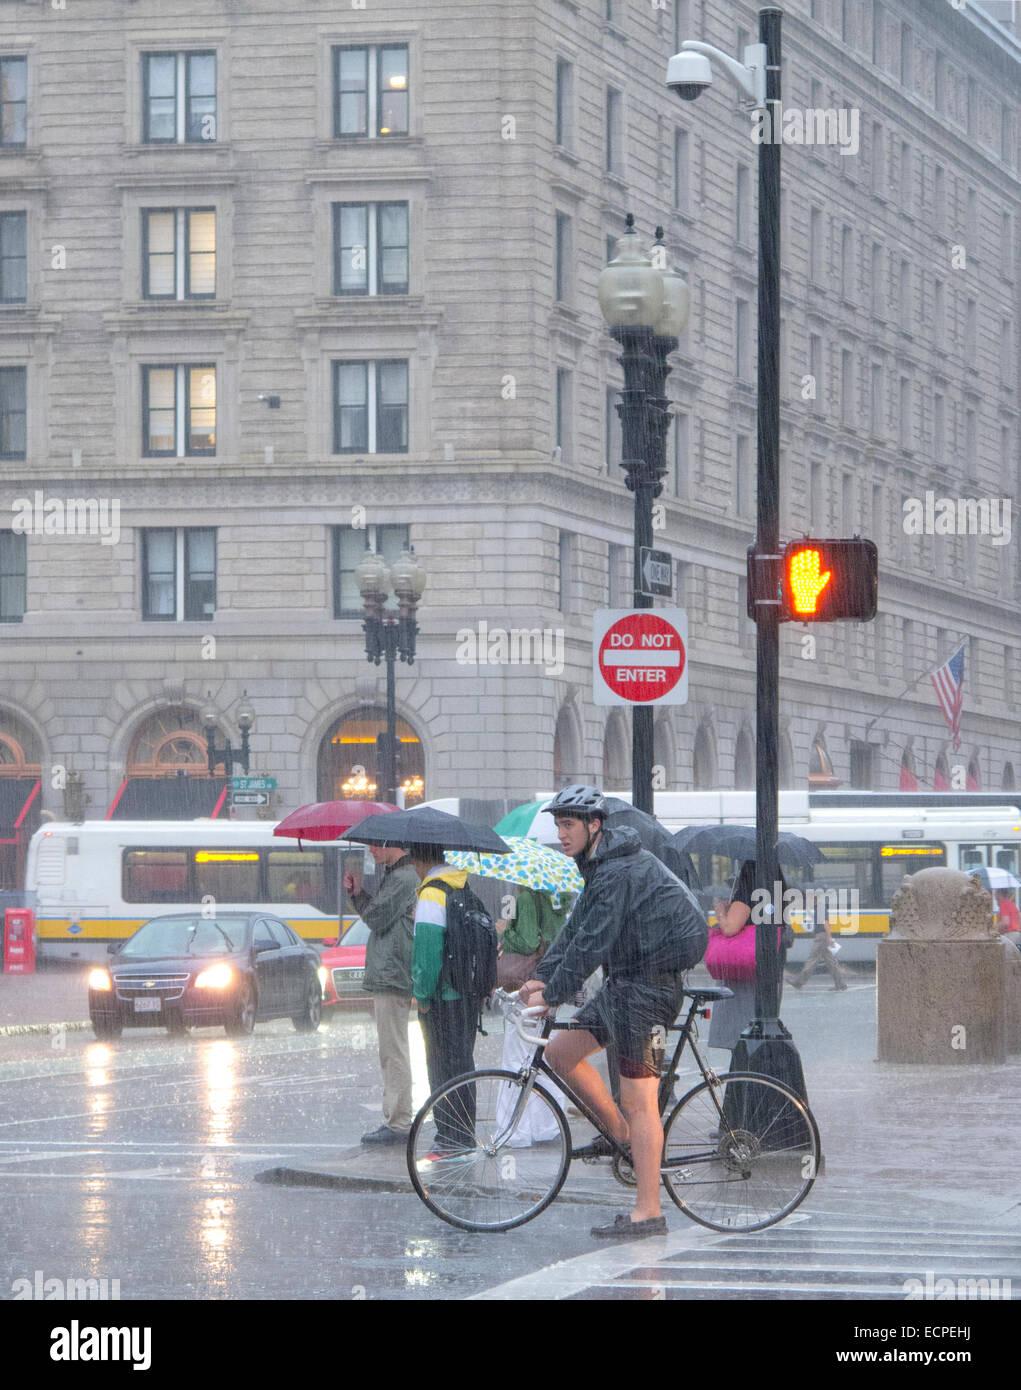 A cyclist waits at a boston traffic light in the rain Stock Photo